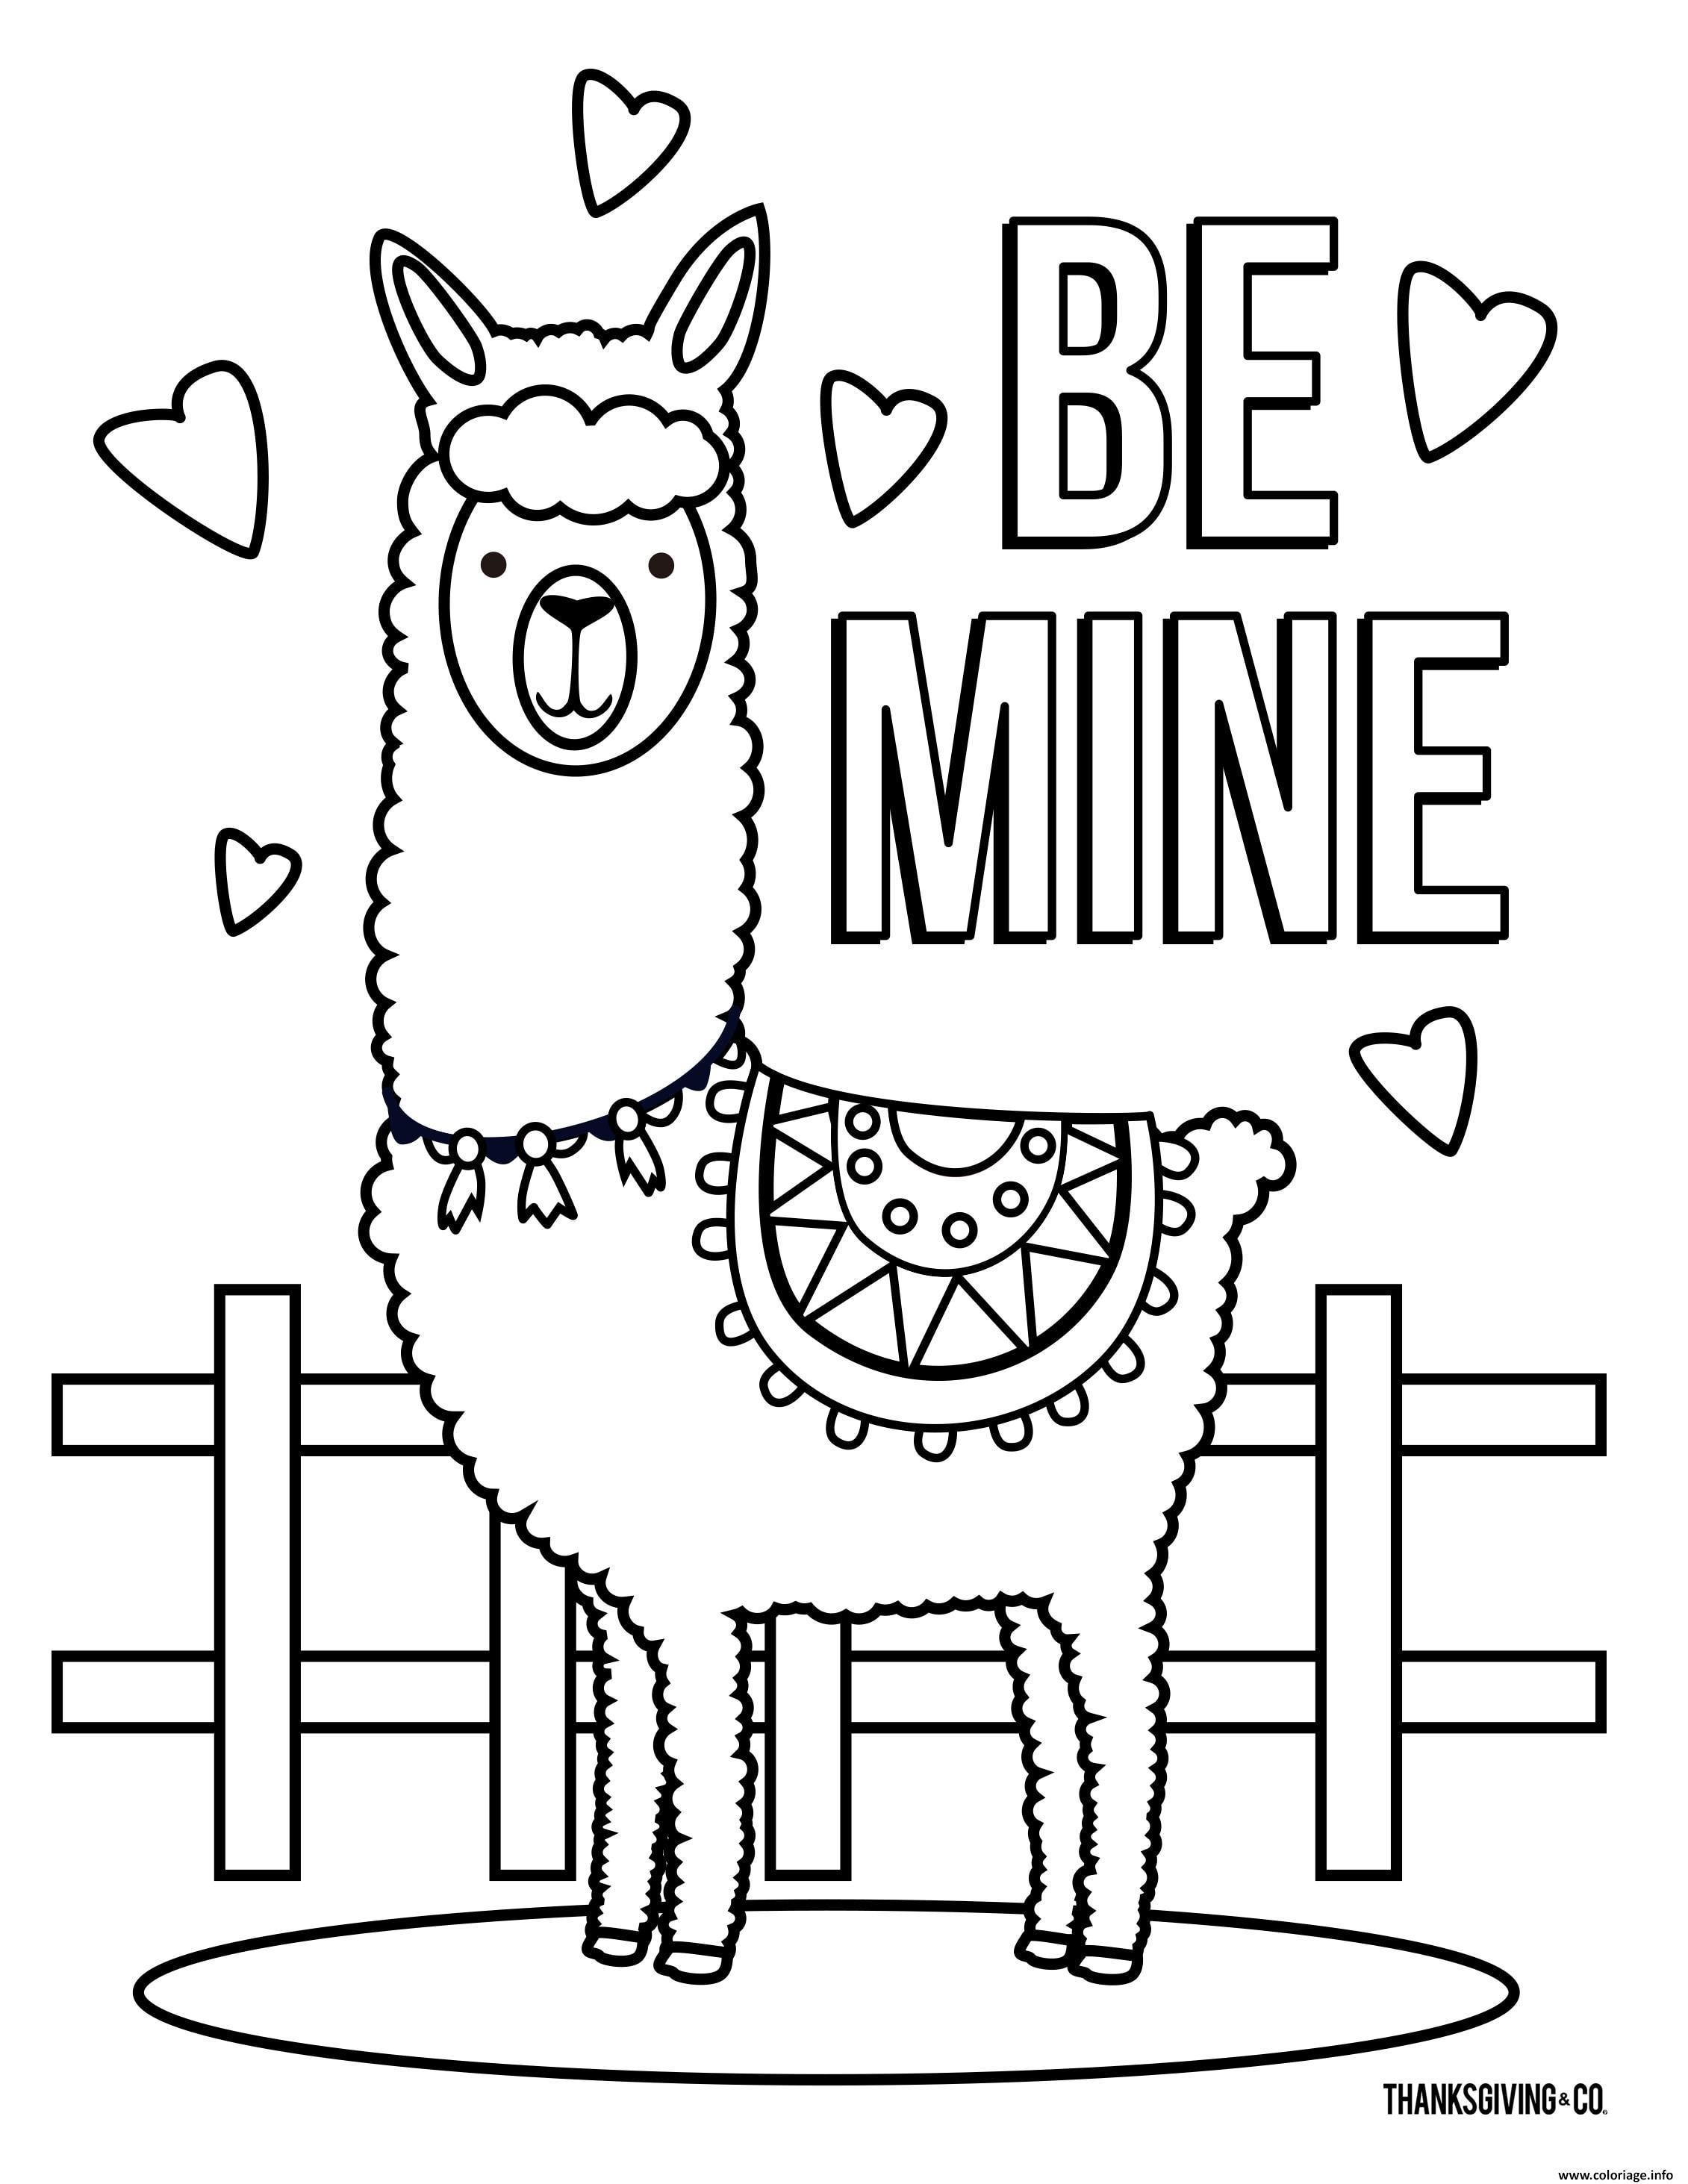 Dessin Llama Be Mine Love Coloriage Gratuit à Imprimer